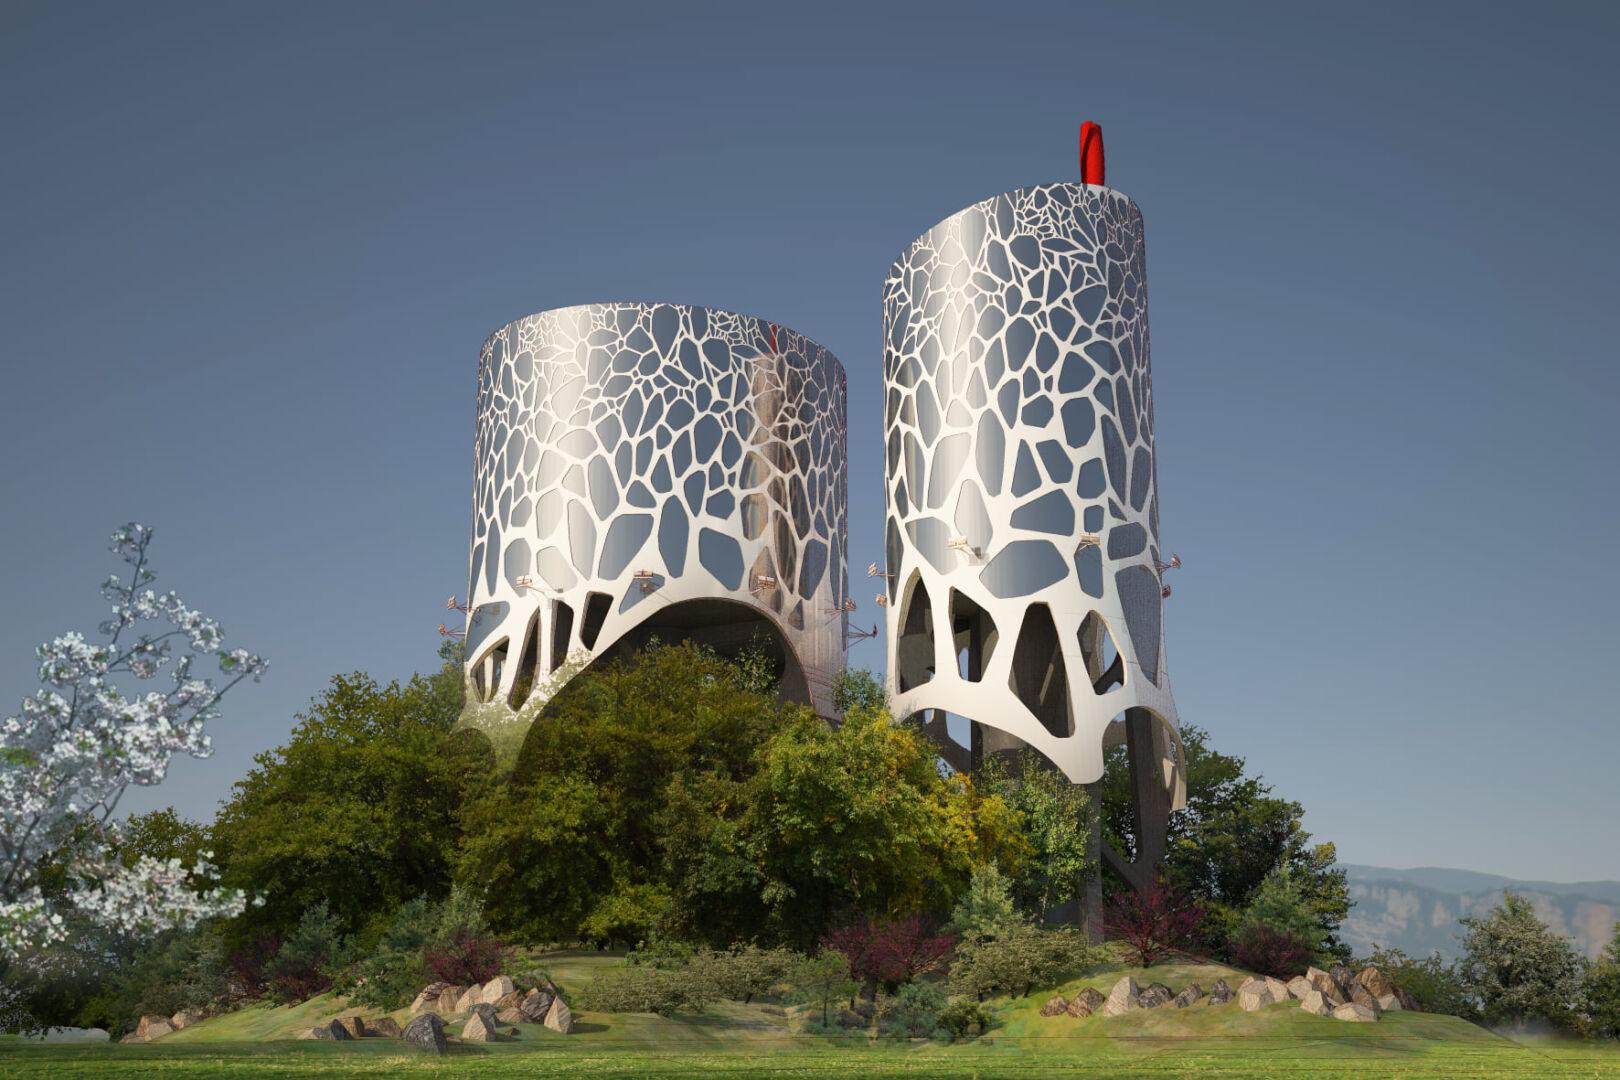 © Atelier Perrin François Seidel Architects